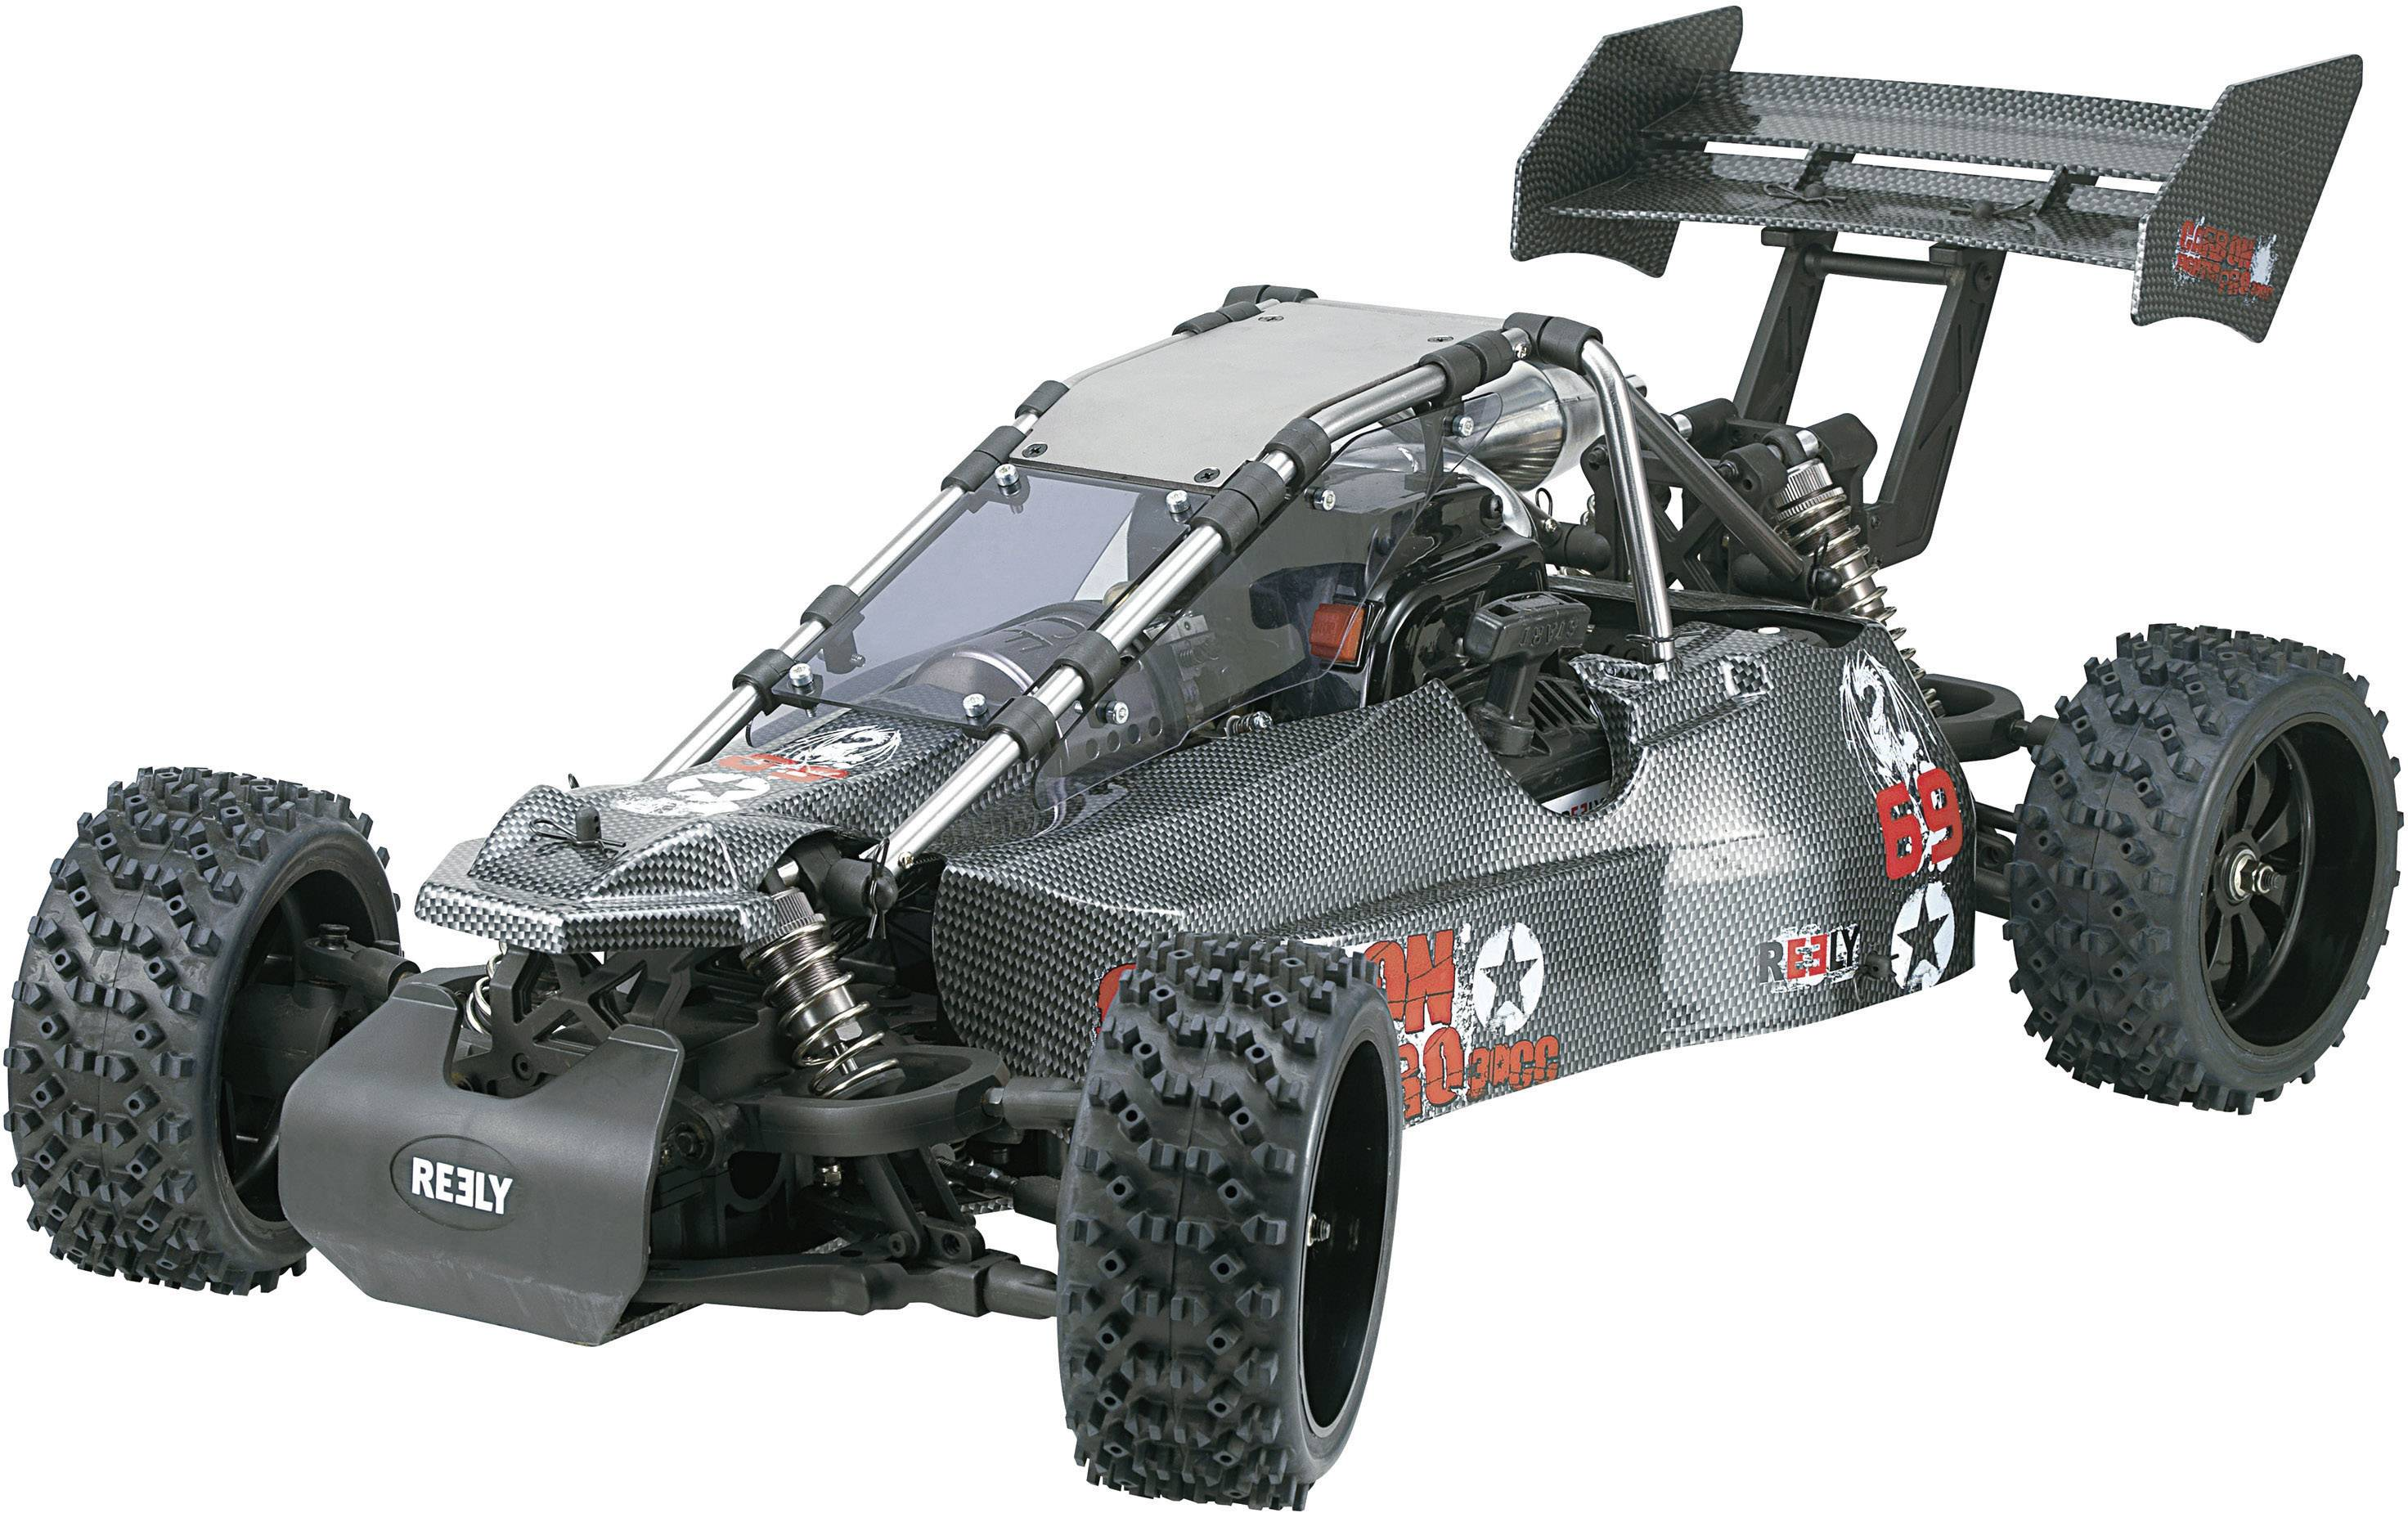 Reely 112196C tuningový diel vhodné pre 1:6 Buggy Carbon Fighter ARR (236999), 1:6 Buggy Carbon Fighter Pro RtR (236666), 1:6 Buggy Carbon Fighter RtR (236600)